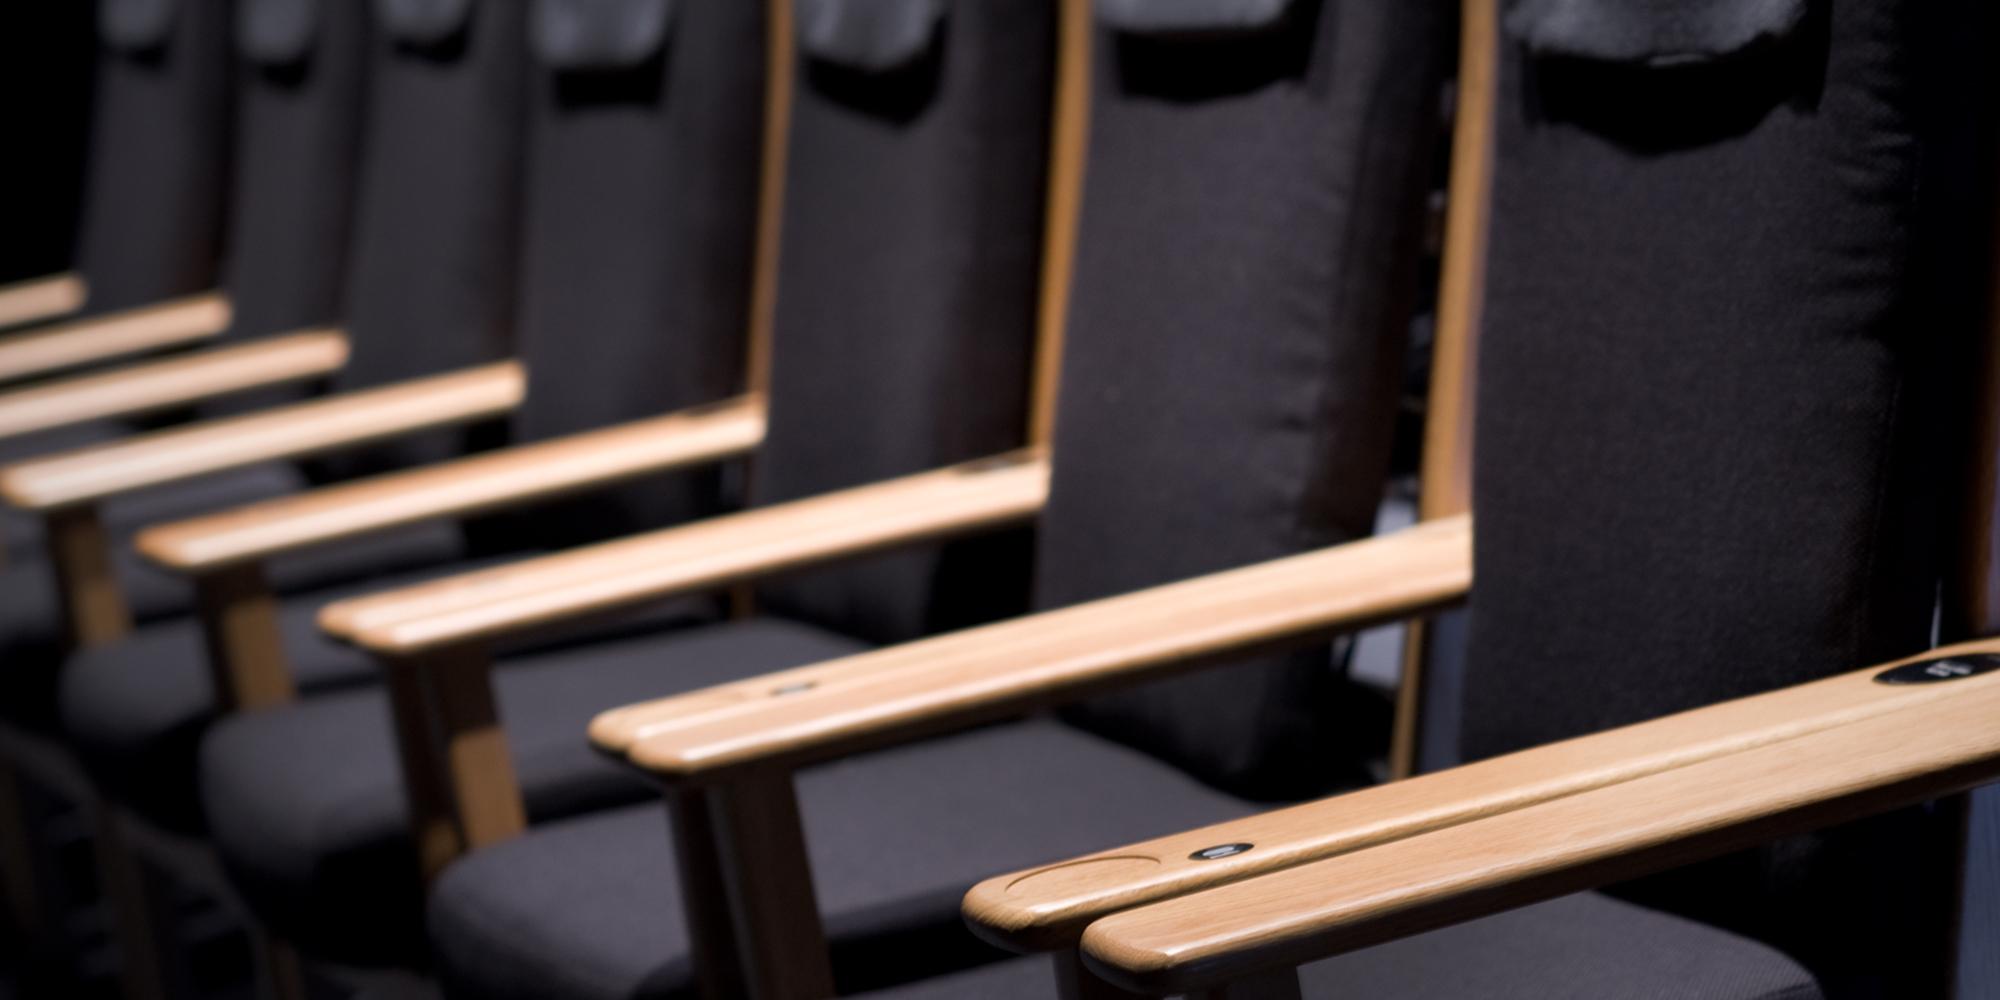 Tyneside Cinema Seating